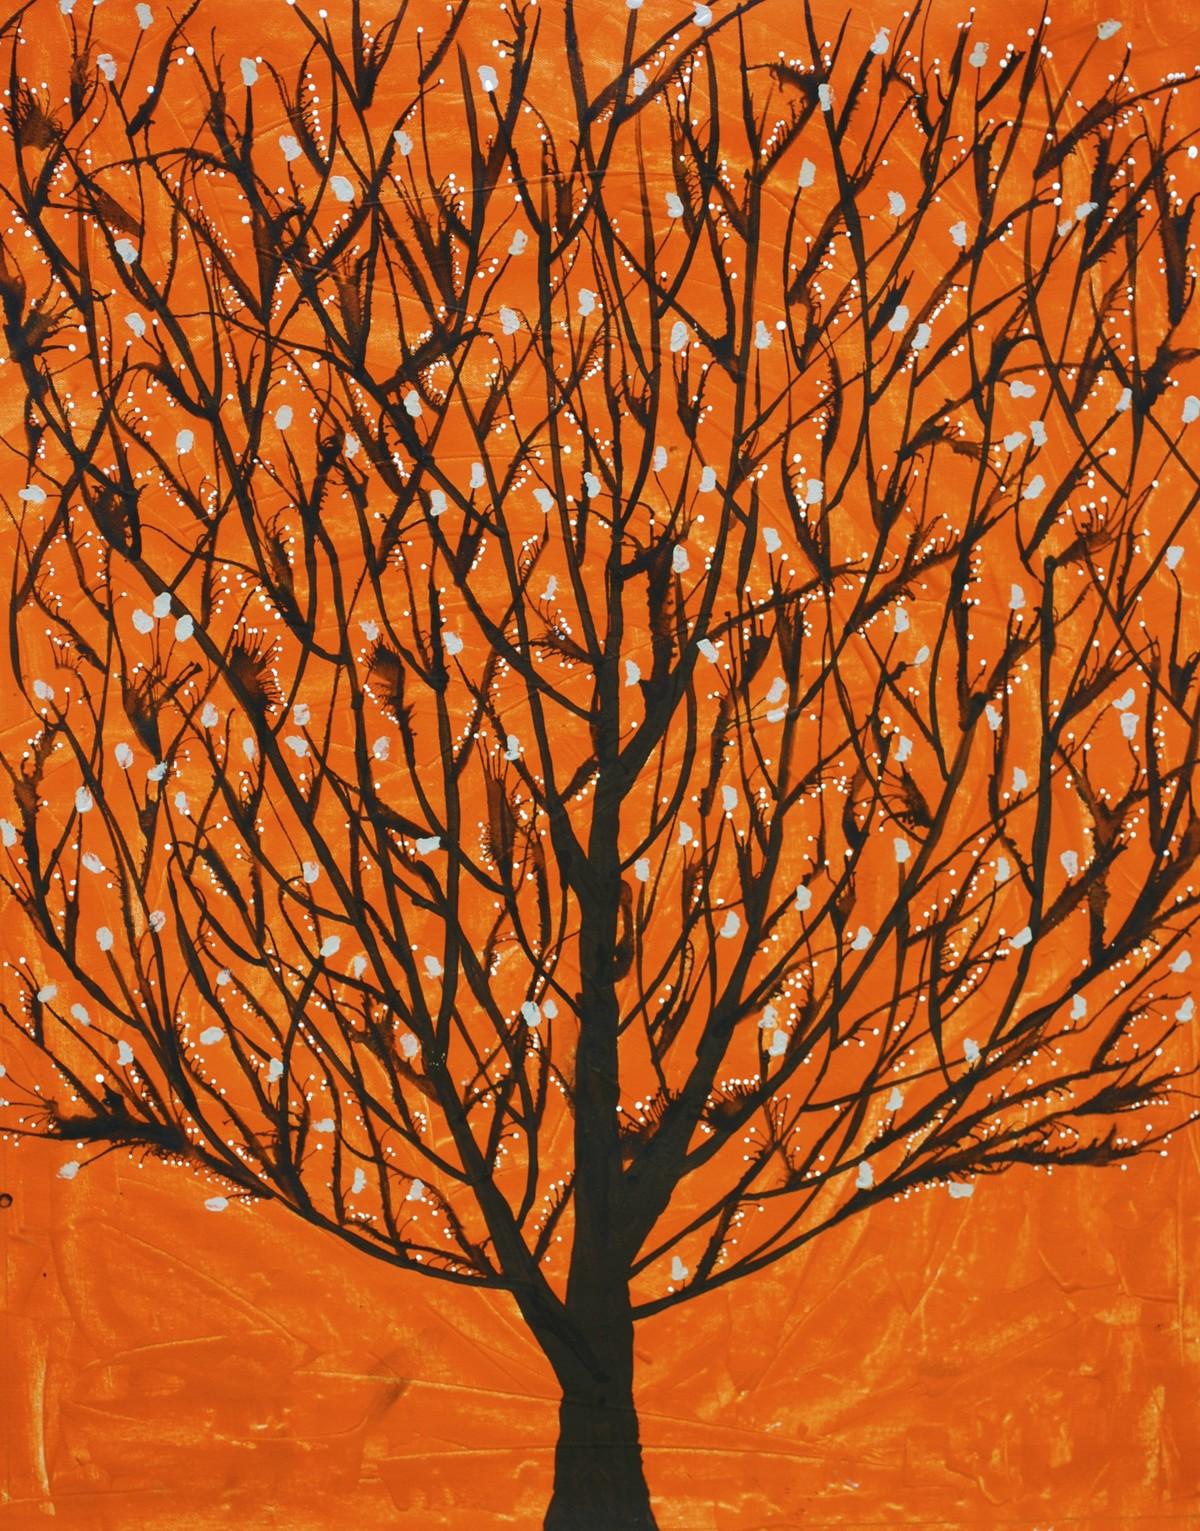 Ubhrav By Artist Sumit Mehndiratta Decorative Painting Mojarto 132839